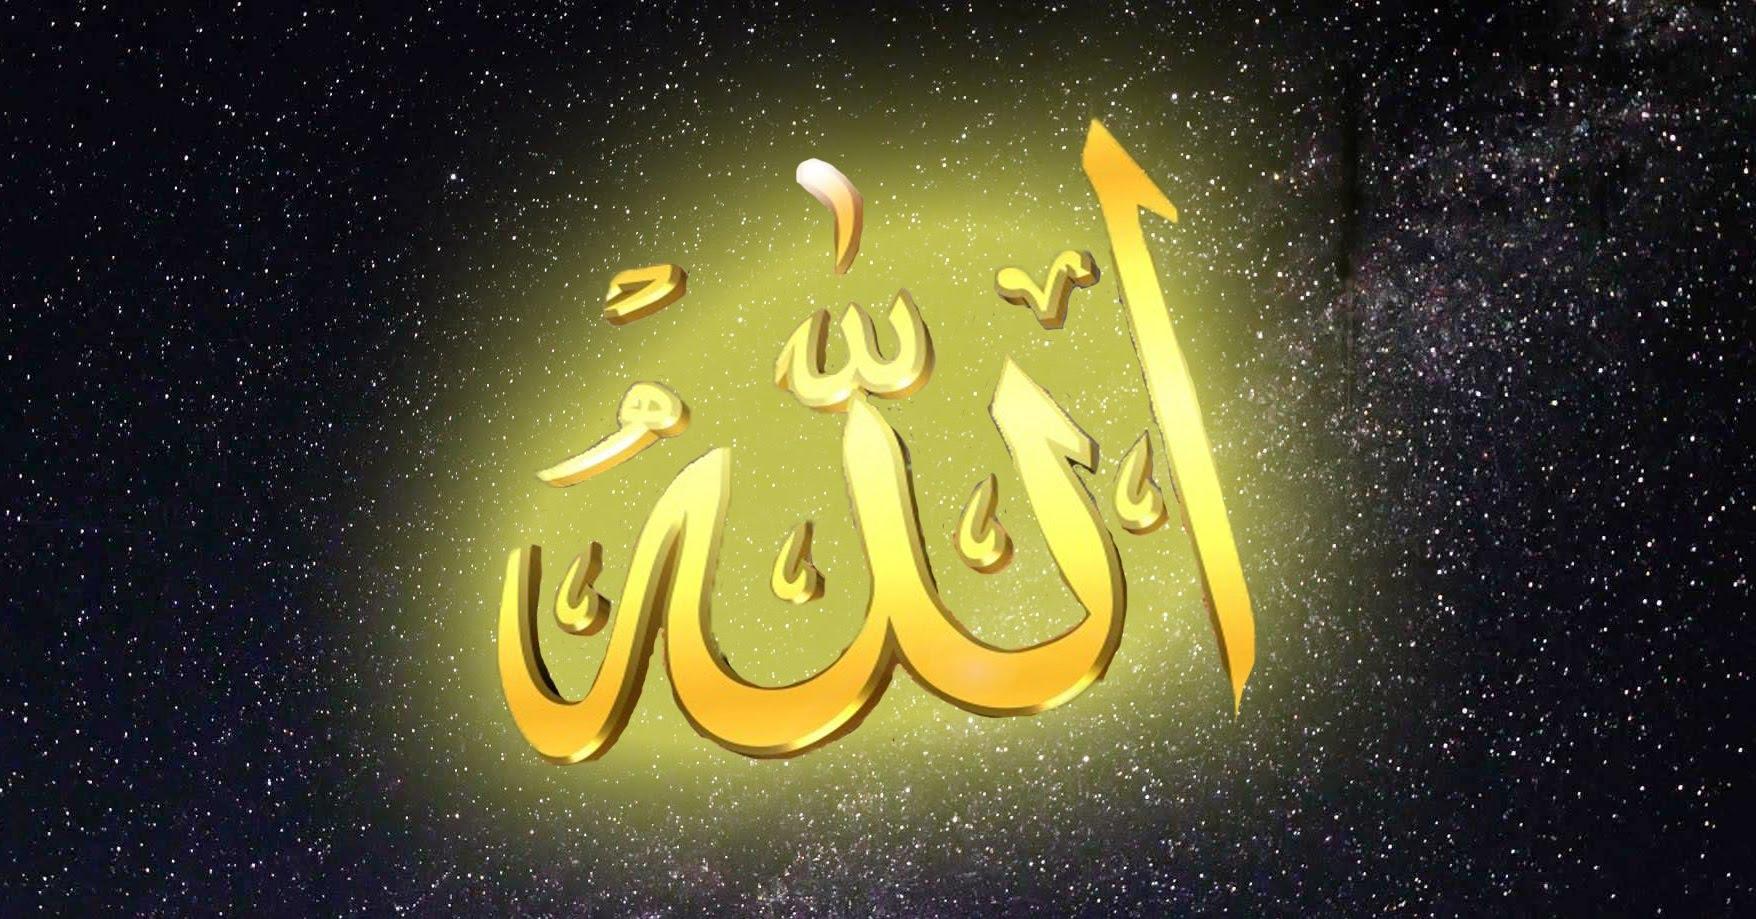 بالصور صور اسم الله , صور اسم الله روعة 2248 14